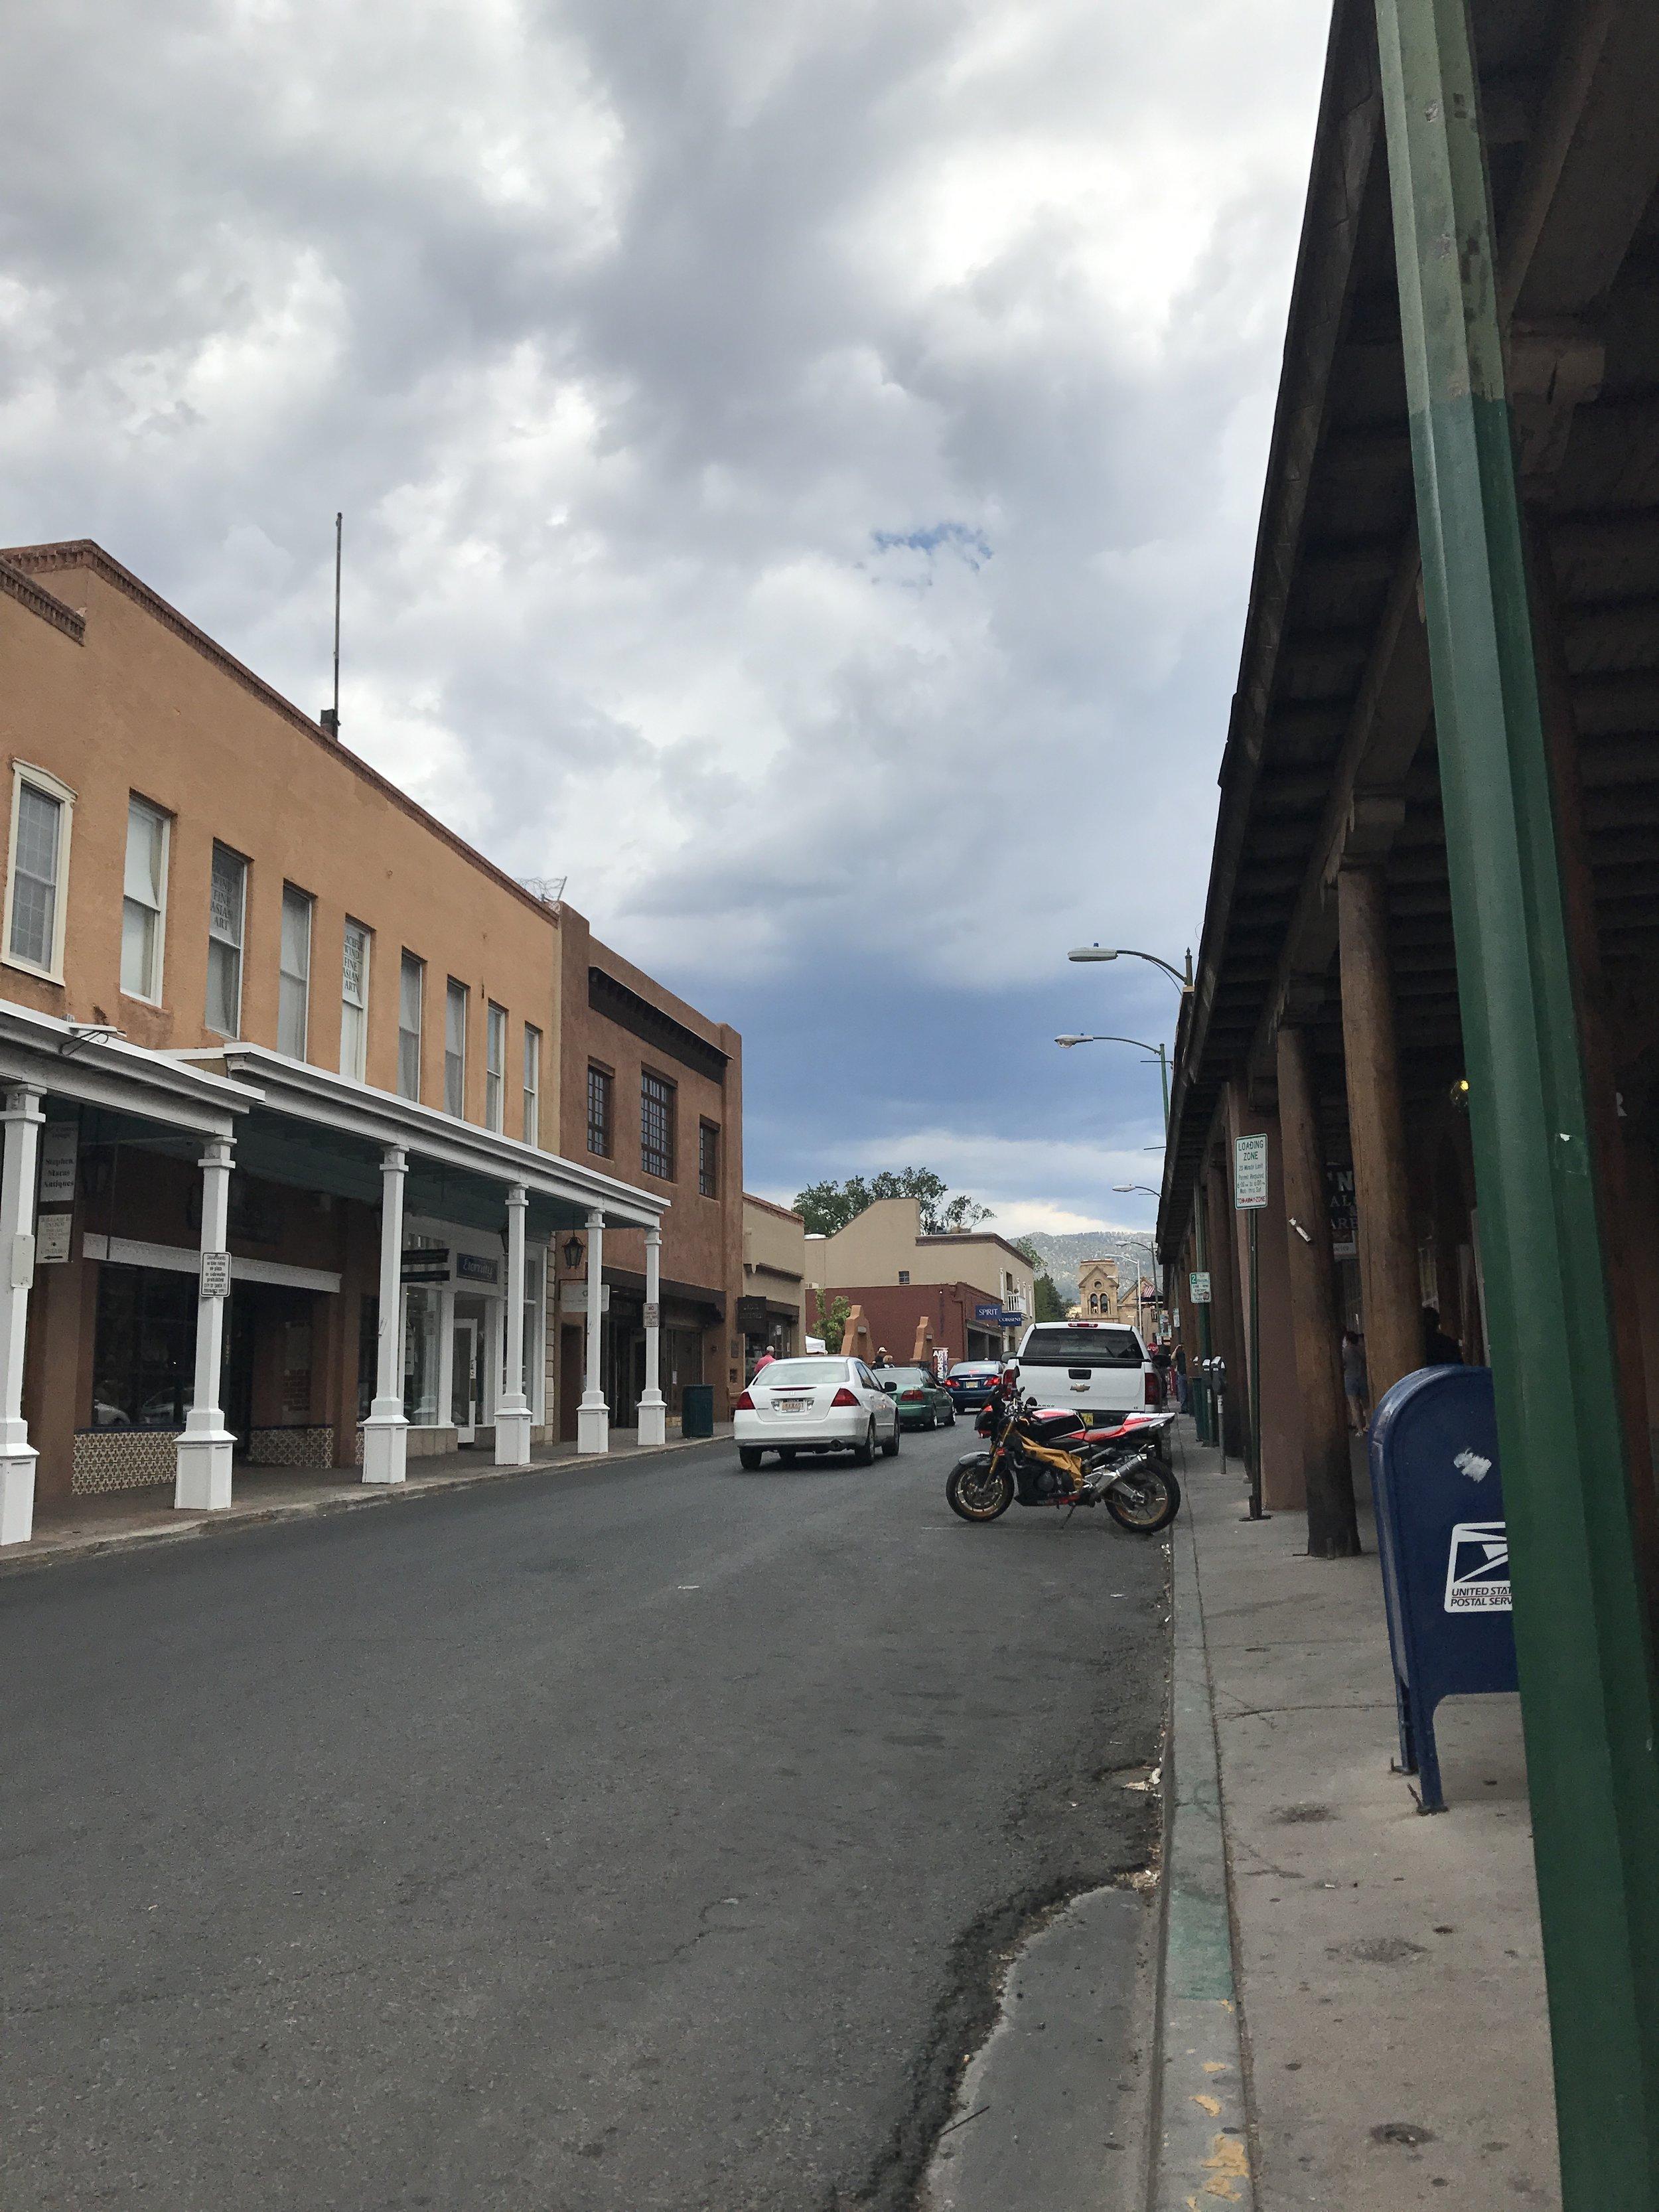 A peak at a street view in Santa Fe